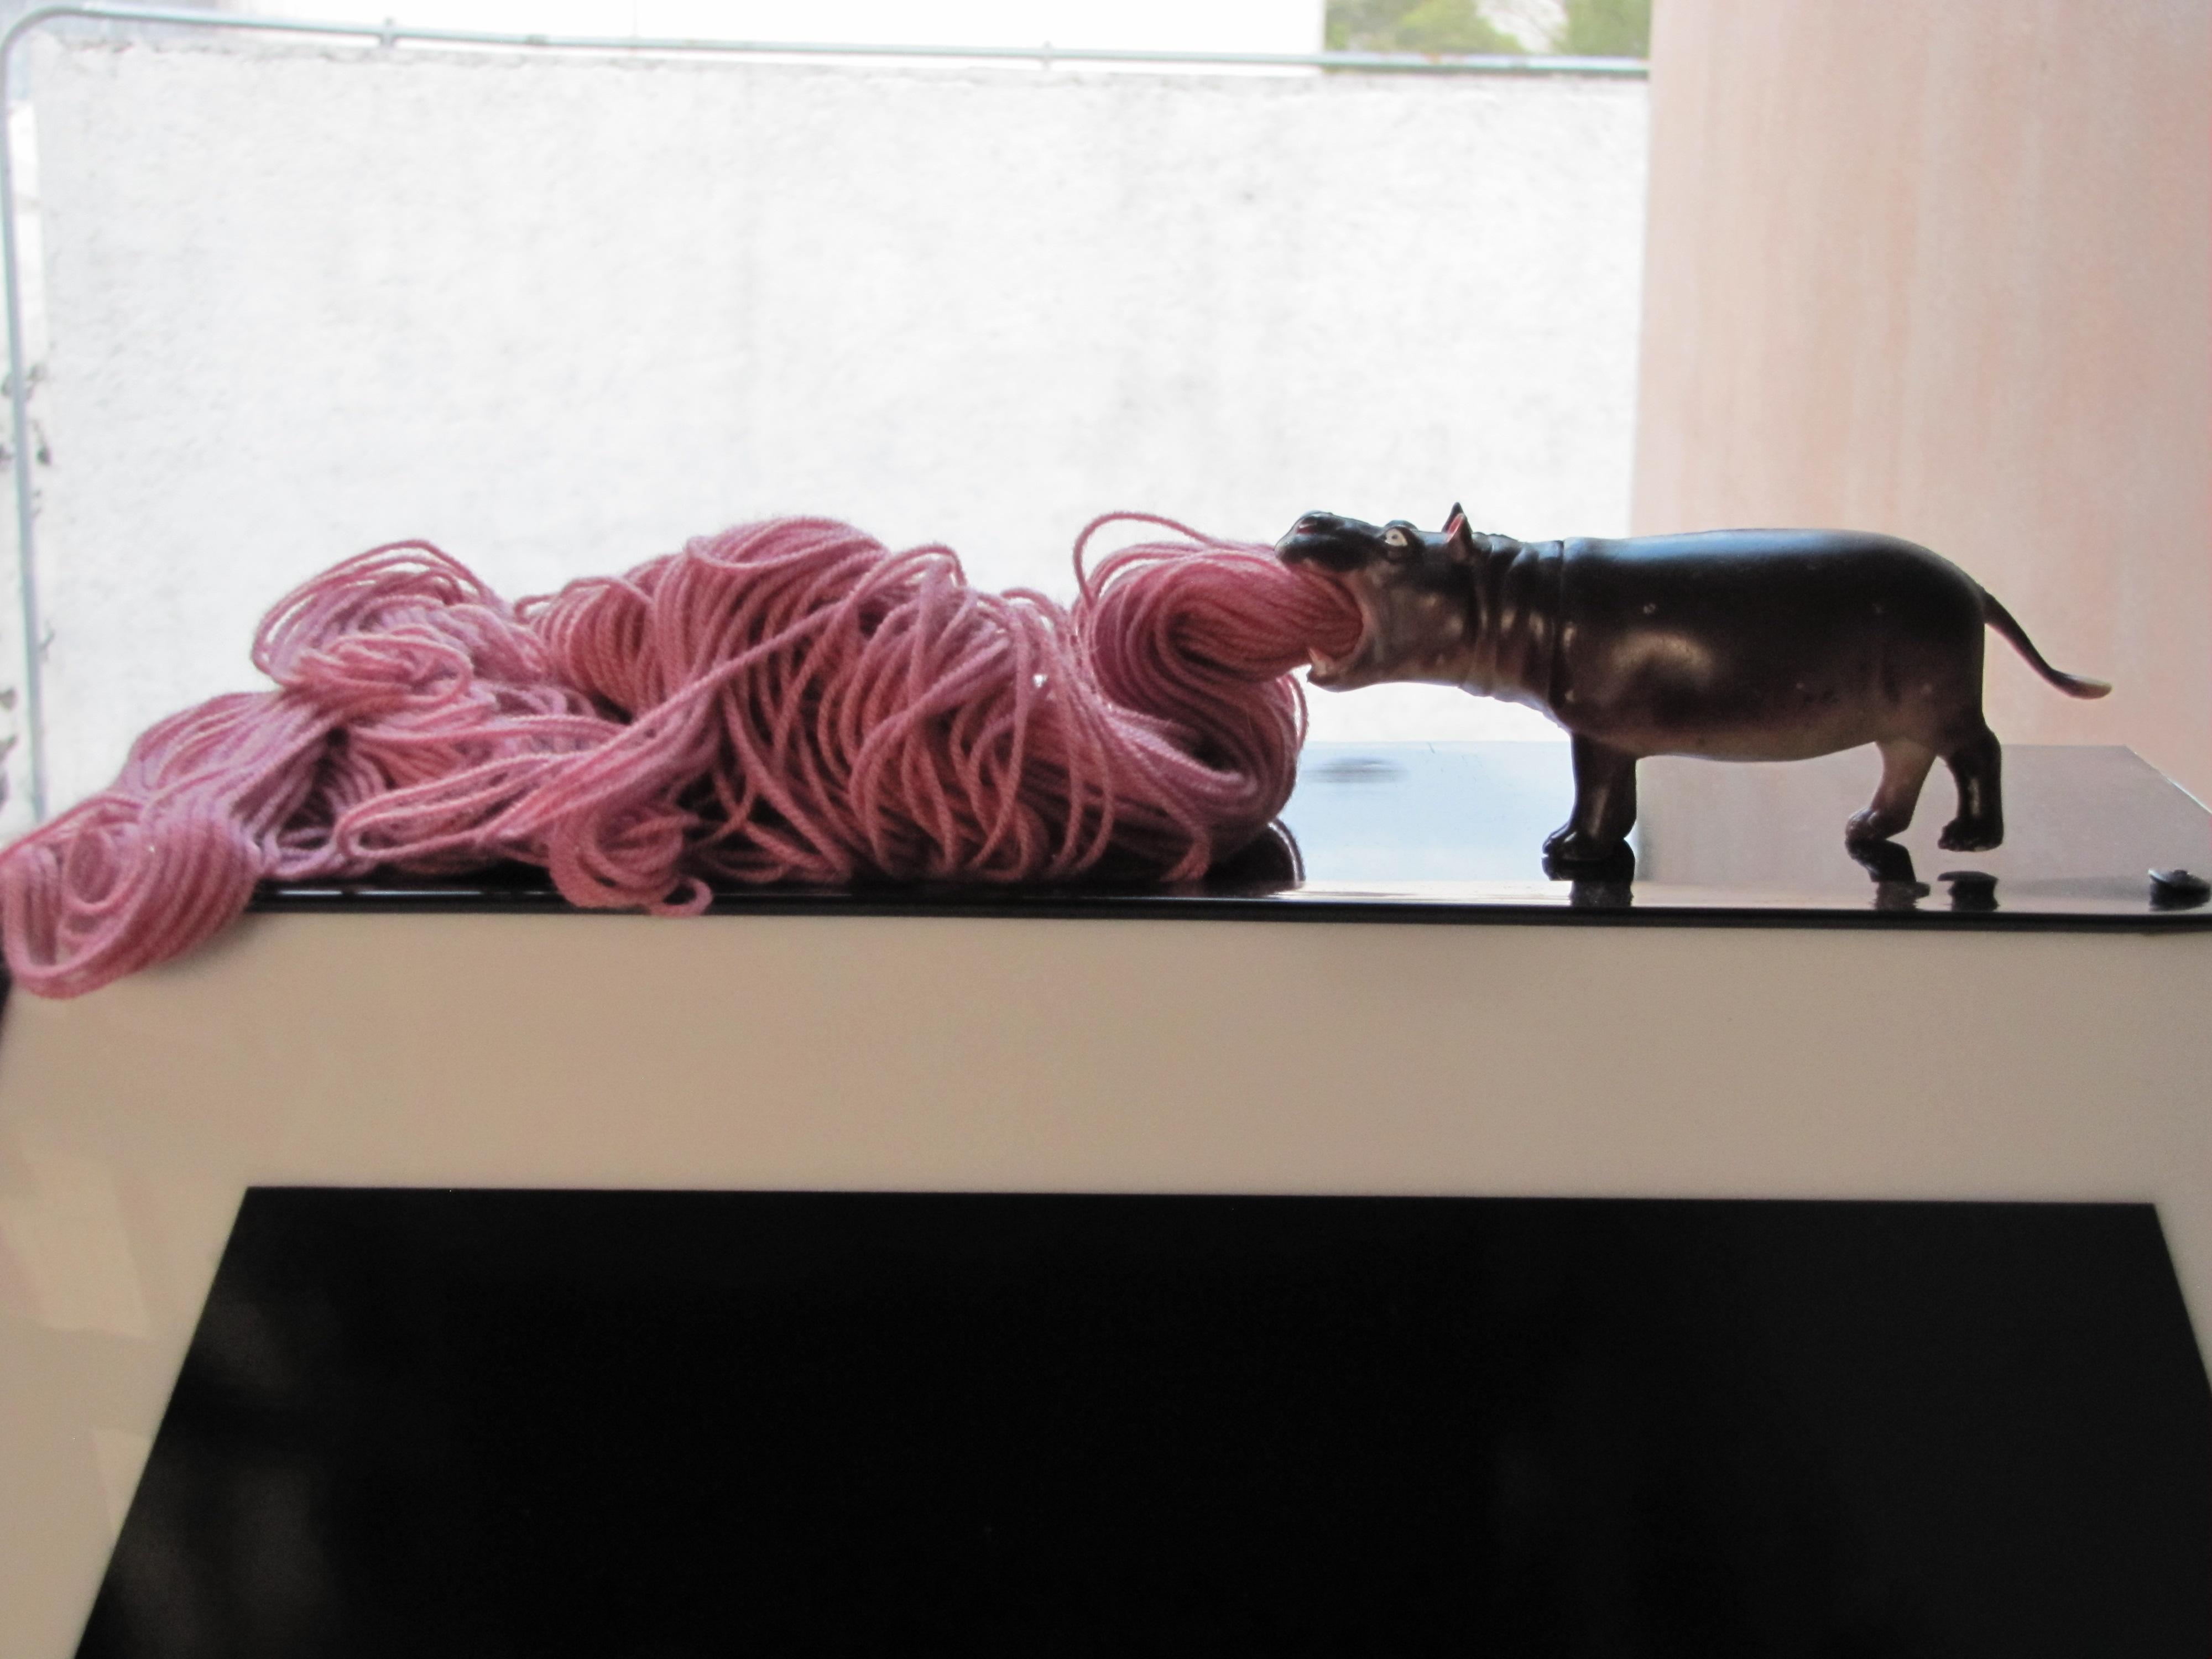 Hippopotamus barf